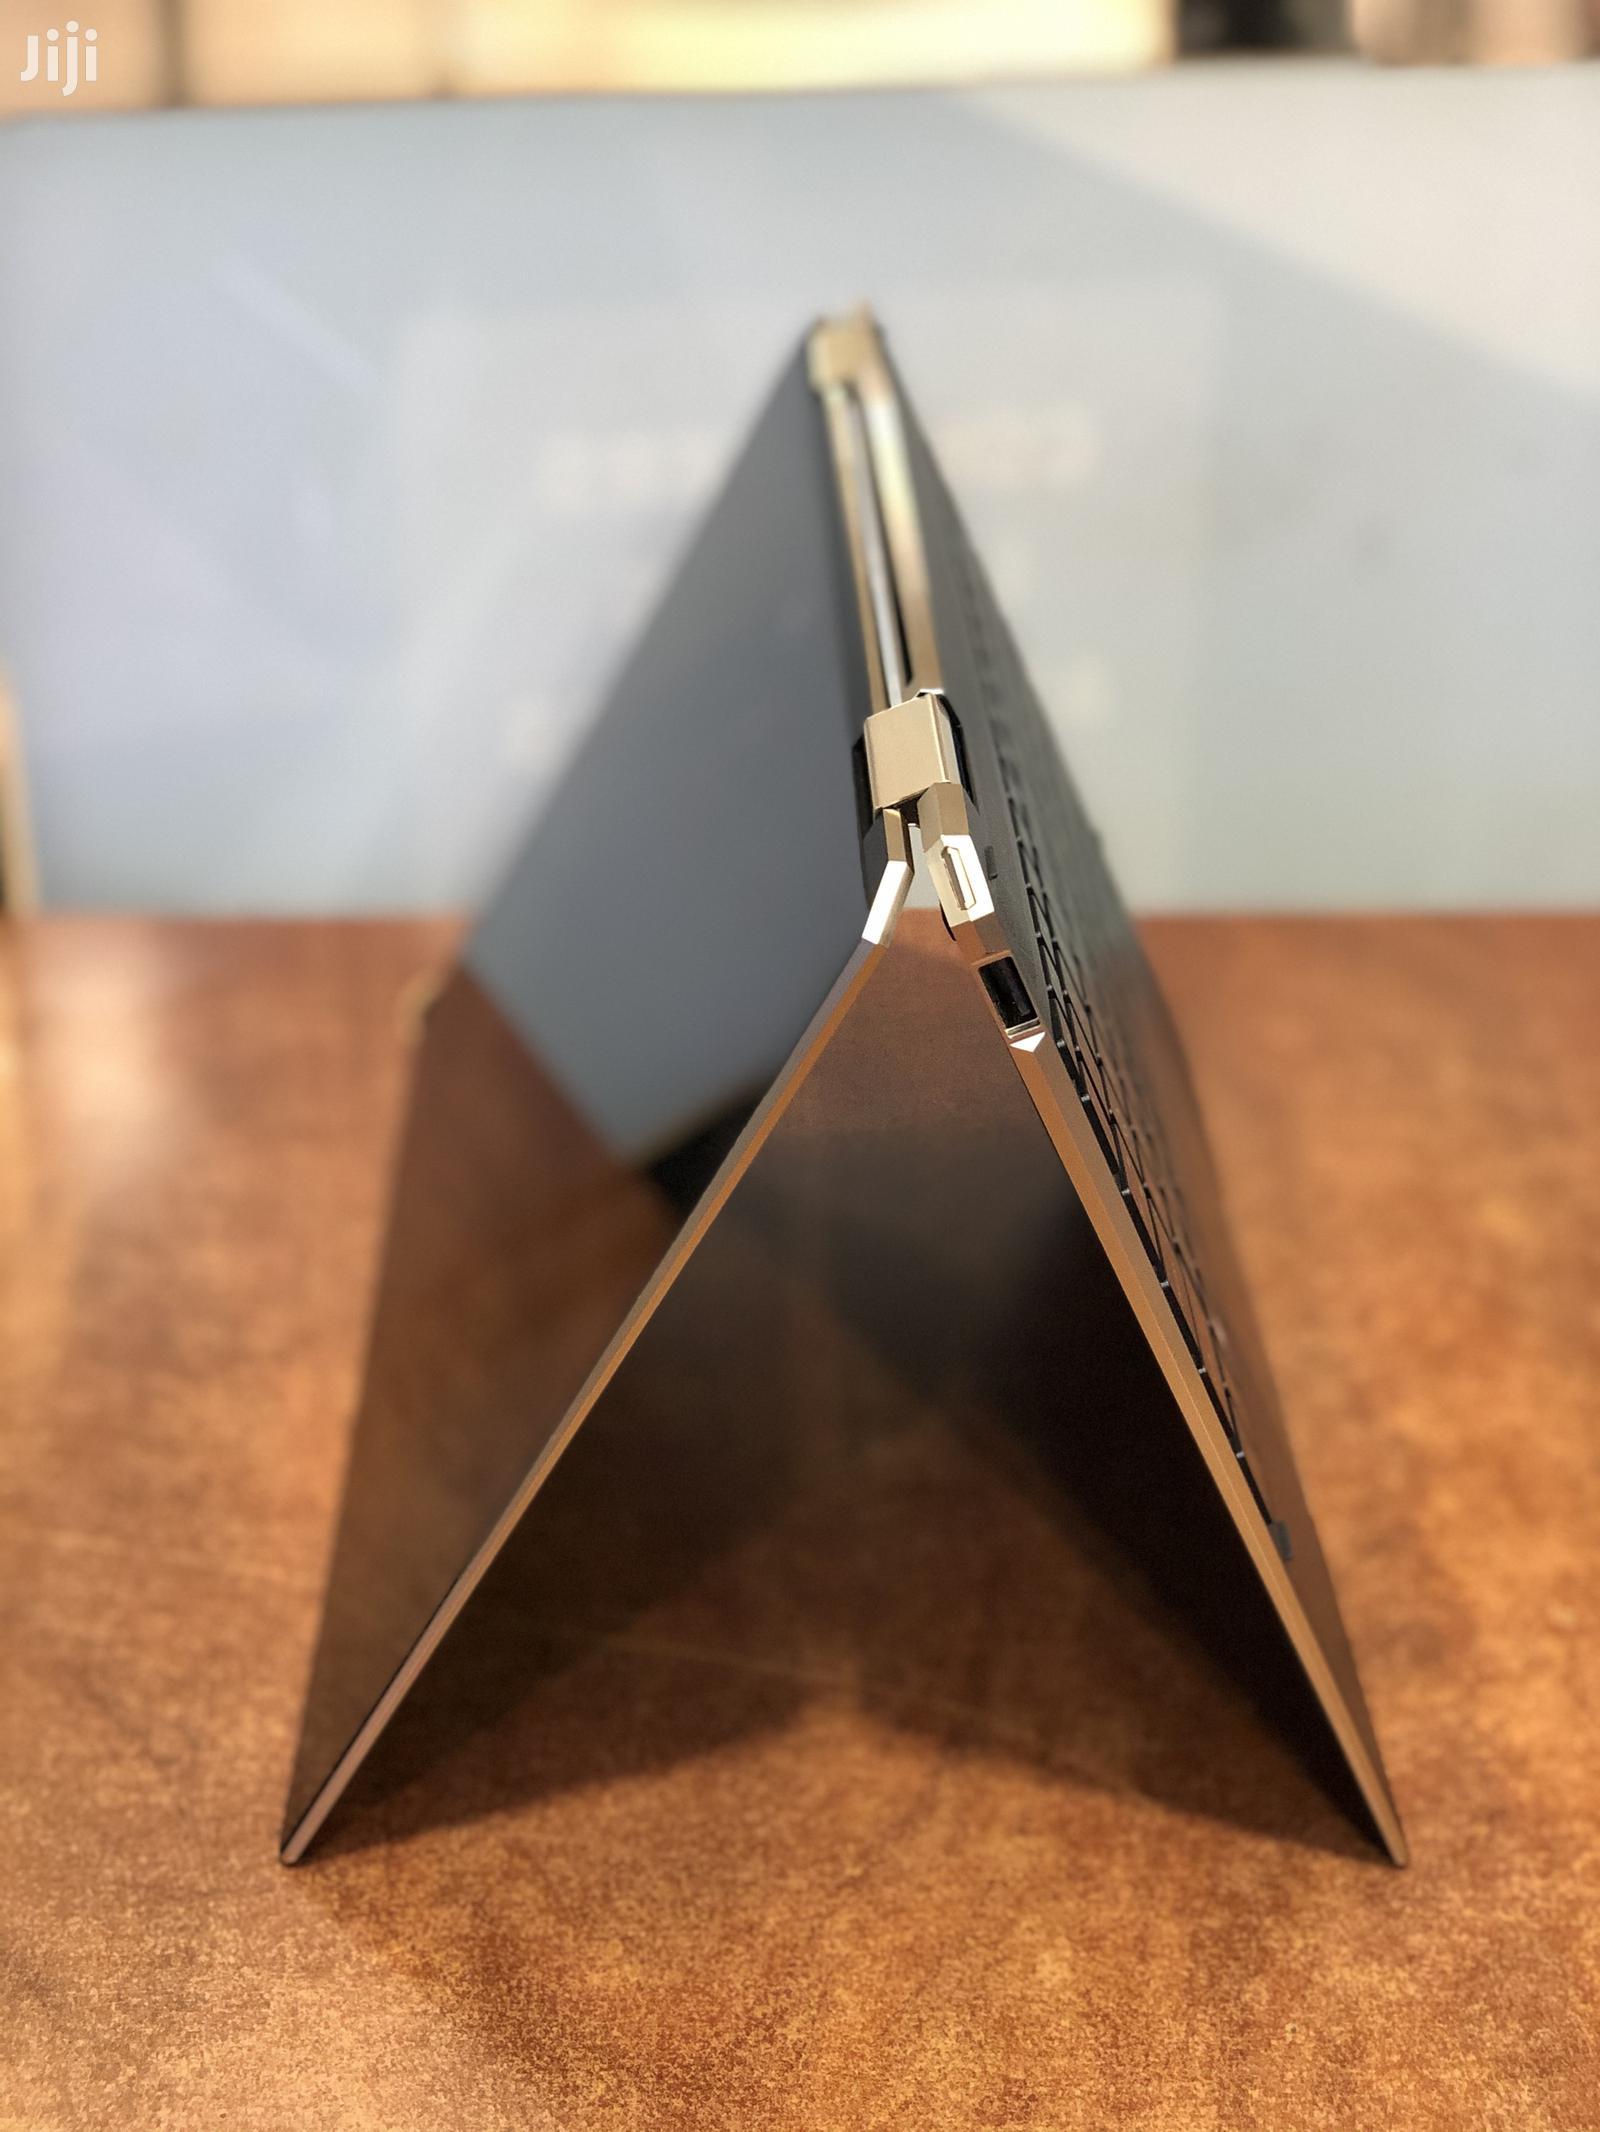 New Laptop HP Spectre X360 16GB Intel Core i7 SSD 512GB | Laptops & Computers for sale in Kampala, Central Region, Uganda